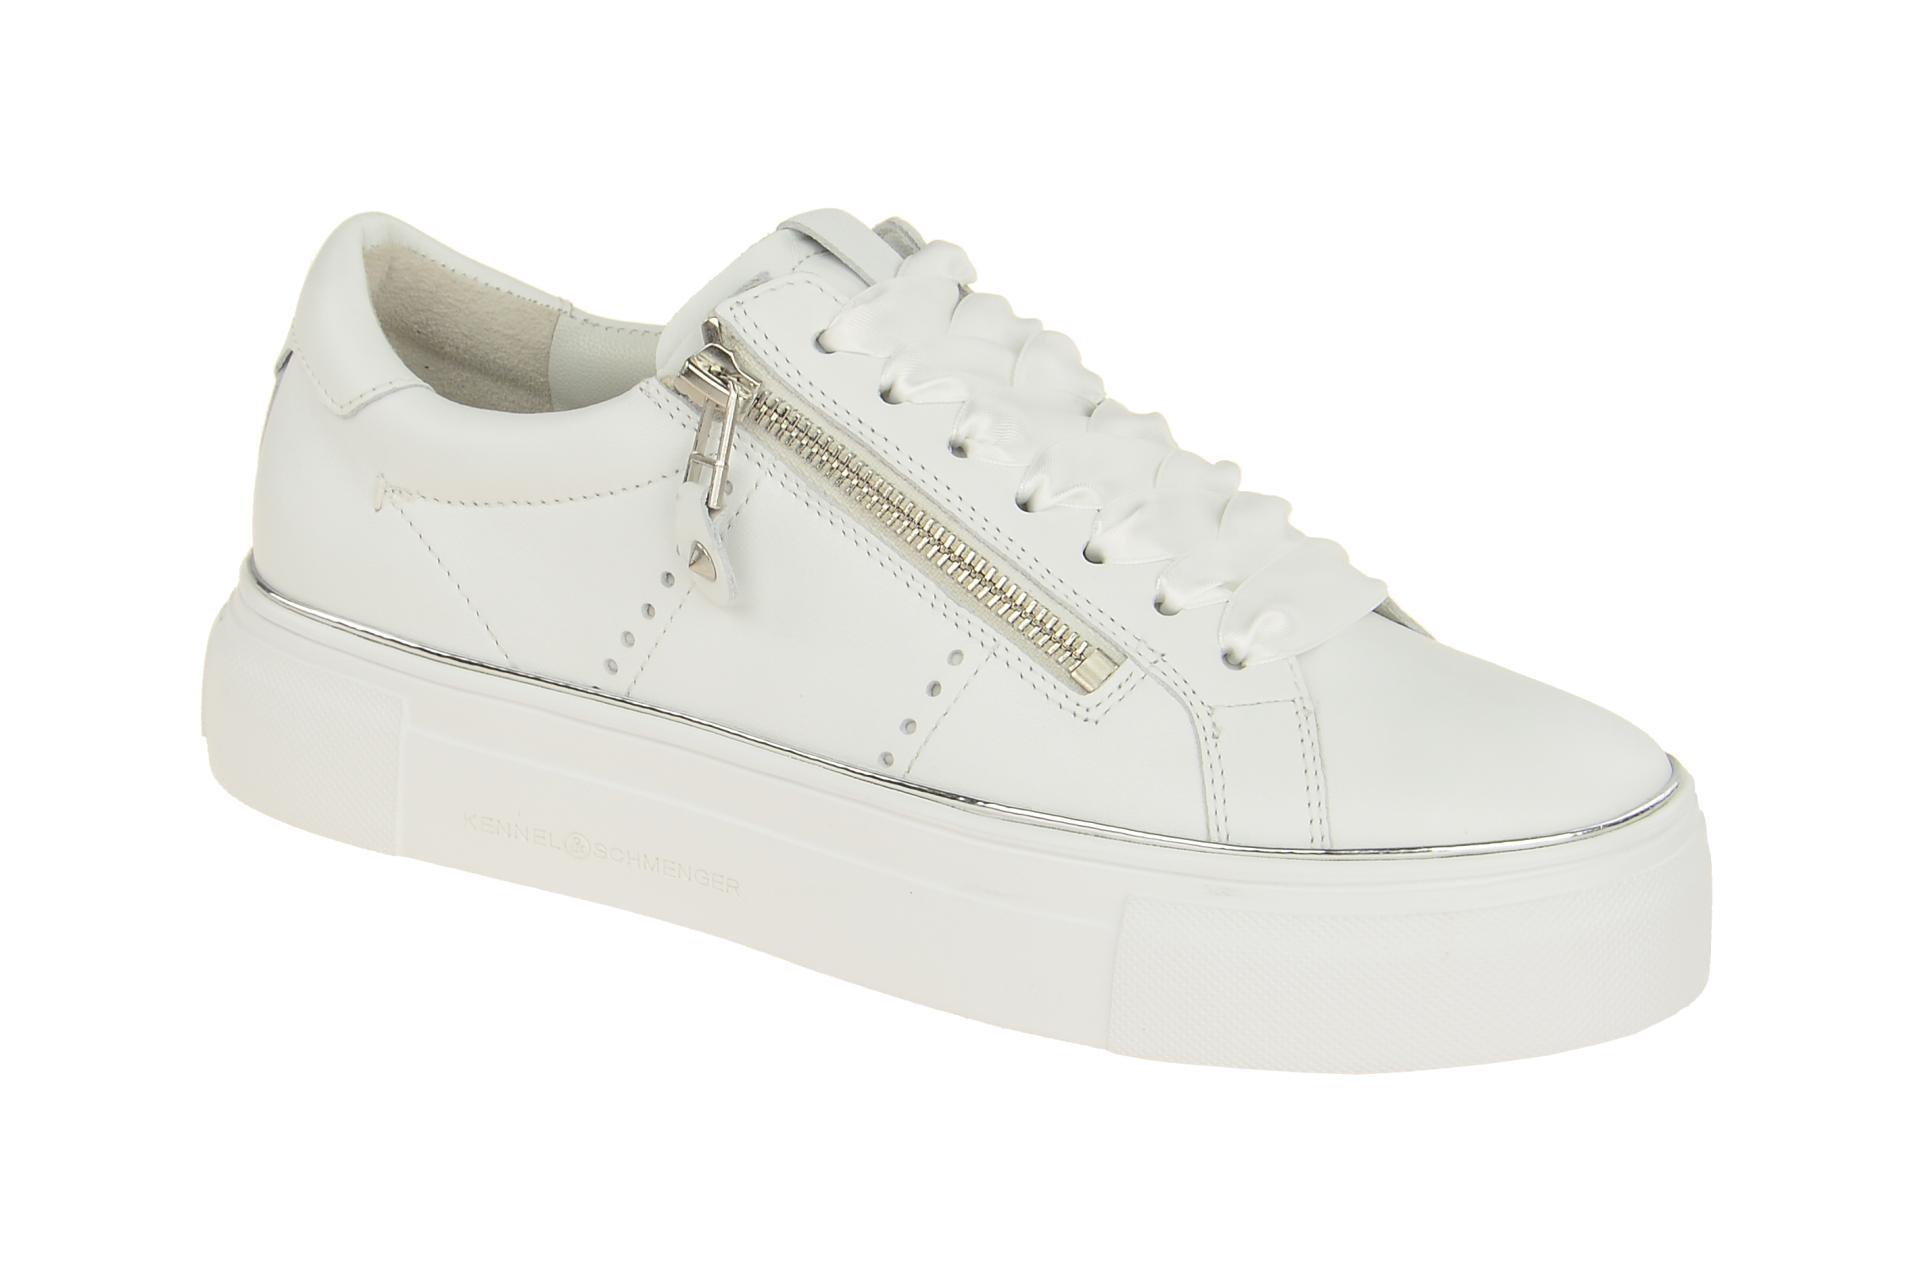 619ffc23f4a6a7 K S Big Sneakers Schuhe weiß 21020 - Schuhhaus Strauch Shop